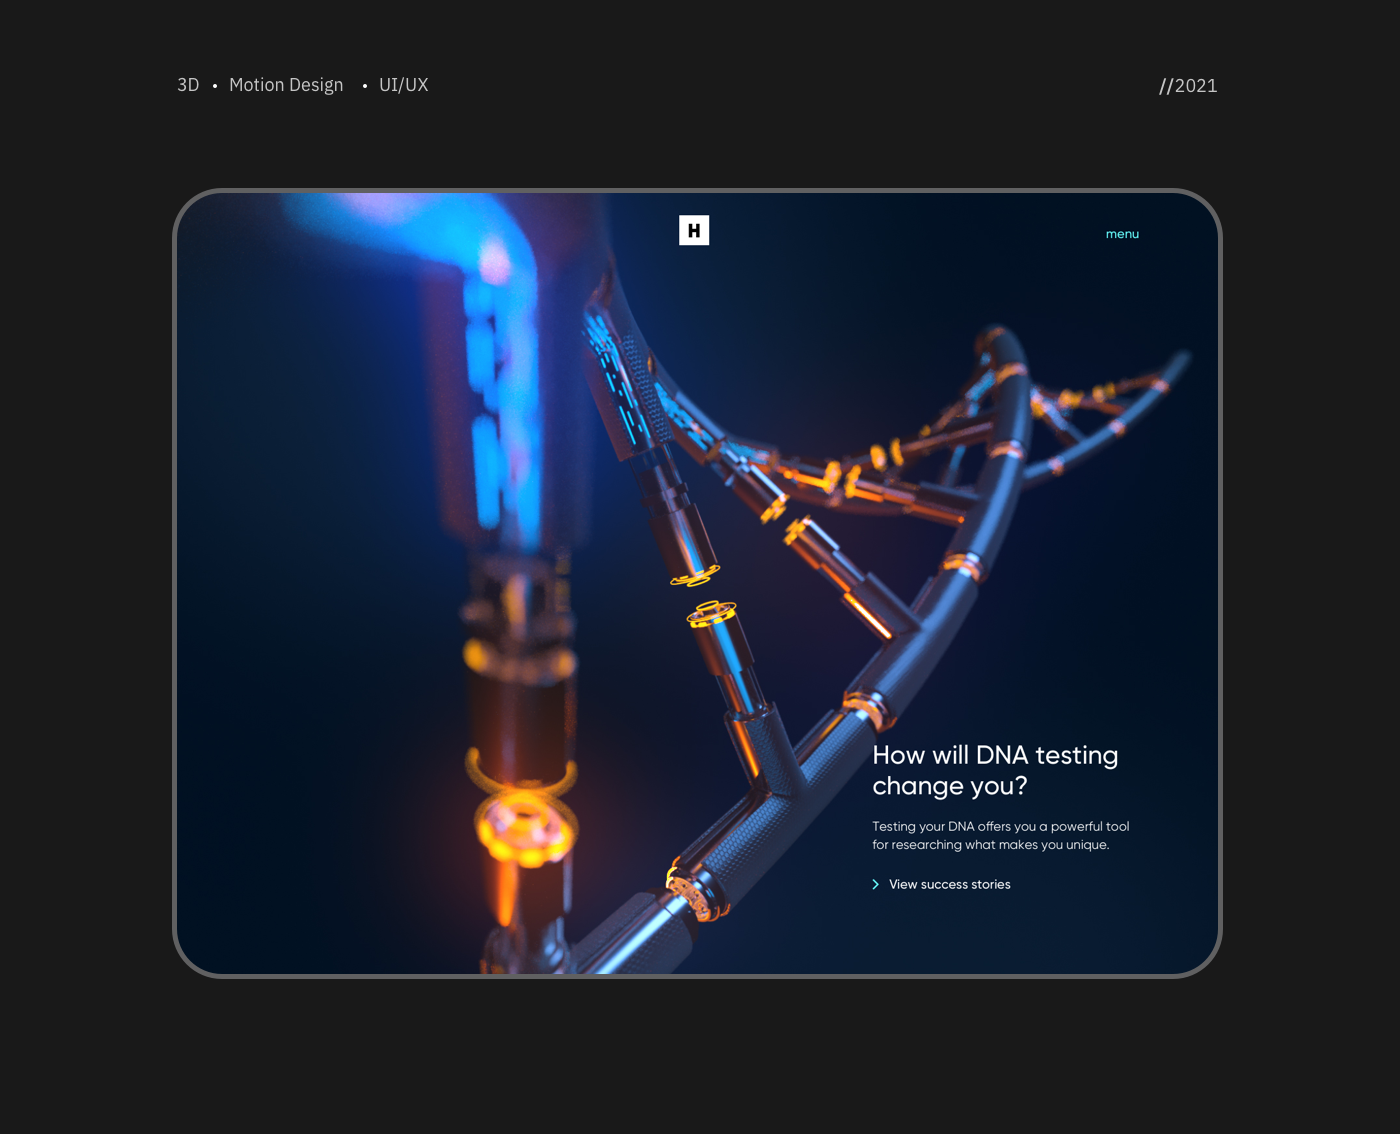 3d modeling animation  design Interface motion design science Technology UI/UX Web Design